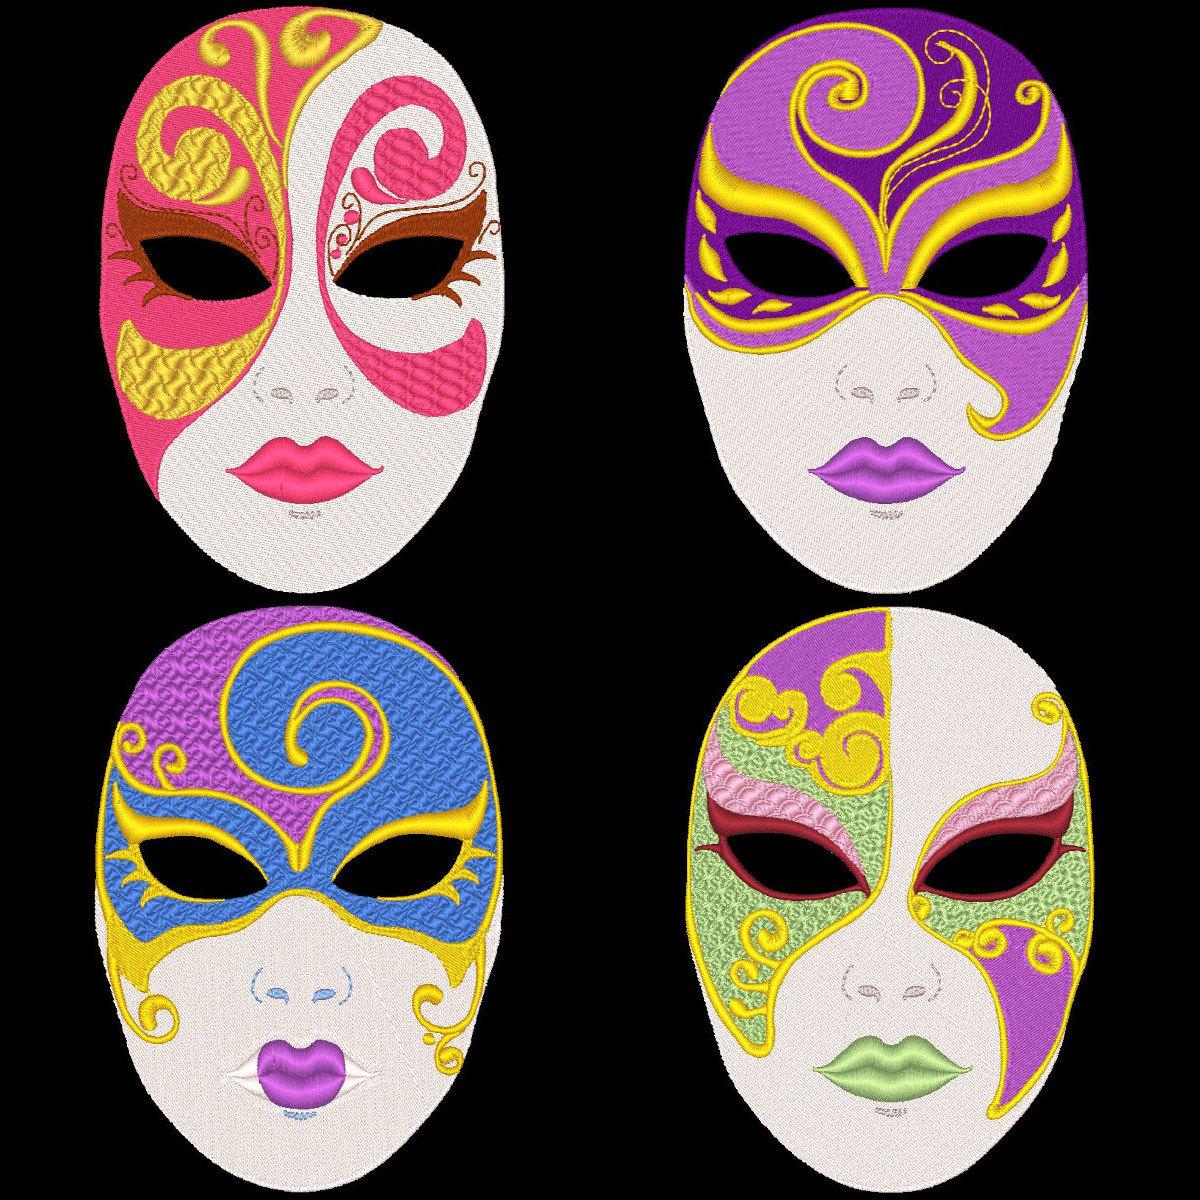 Drawn masks full mask Face designs face  pretty